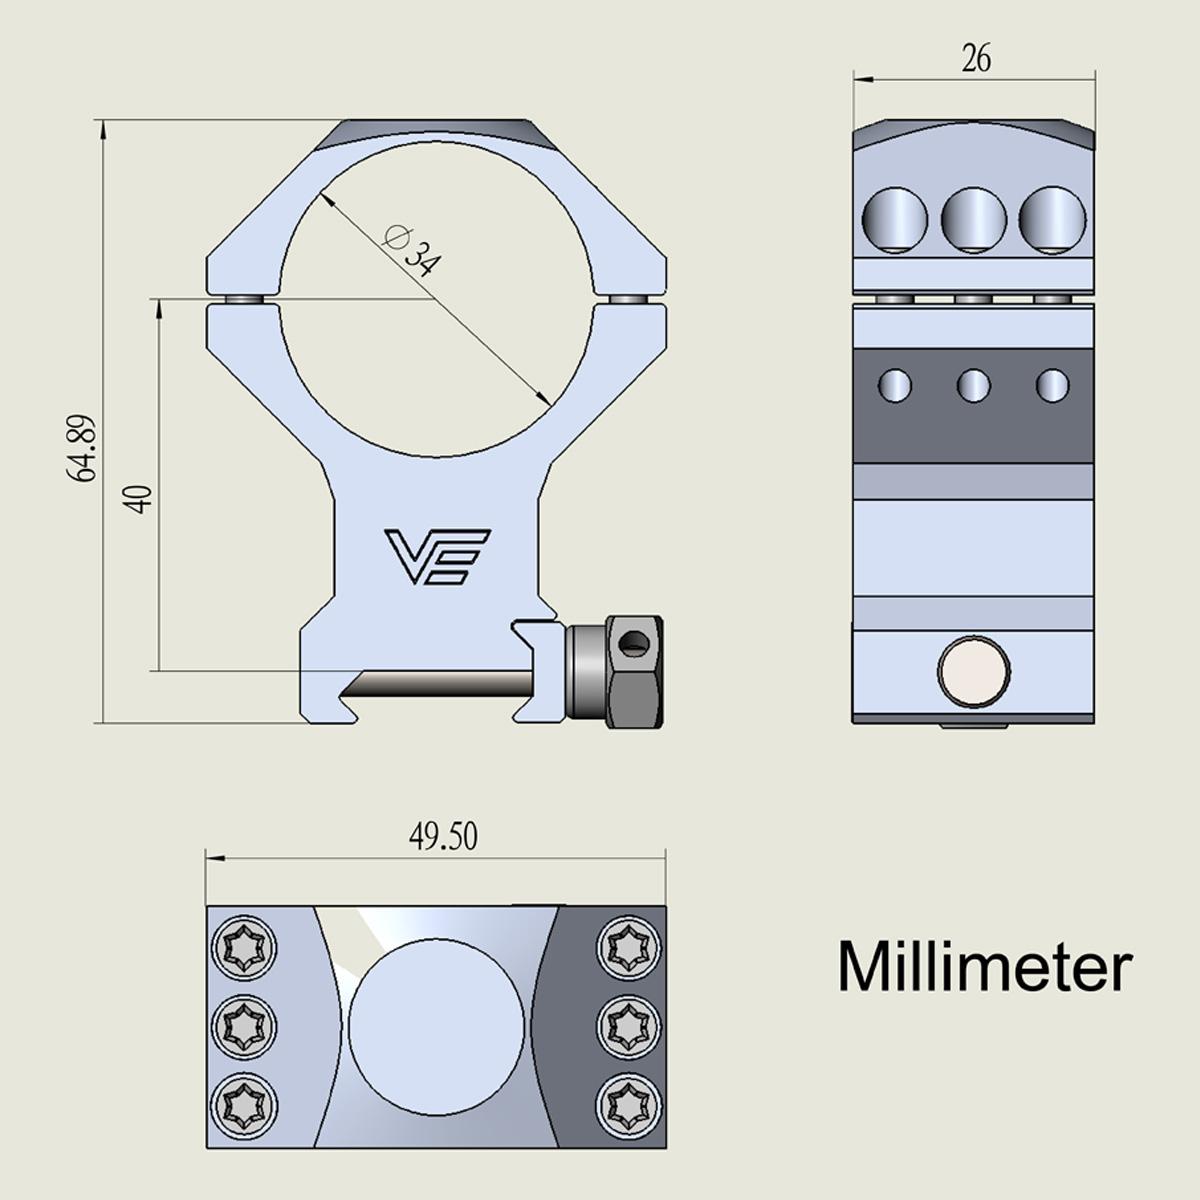 34mm X-Accu High Picatinny Rings Acom Diagram